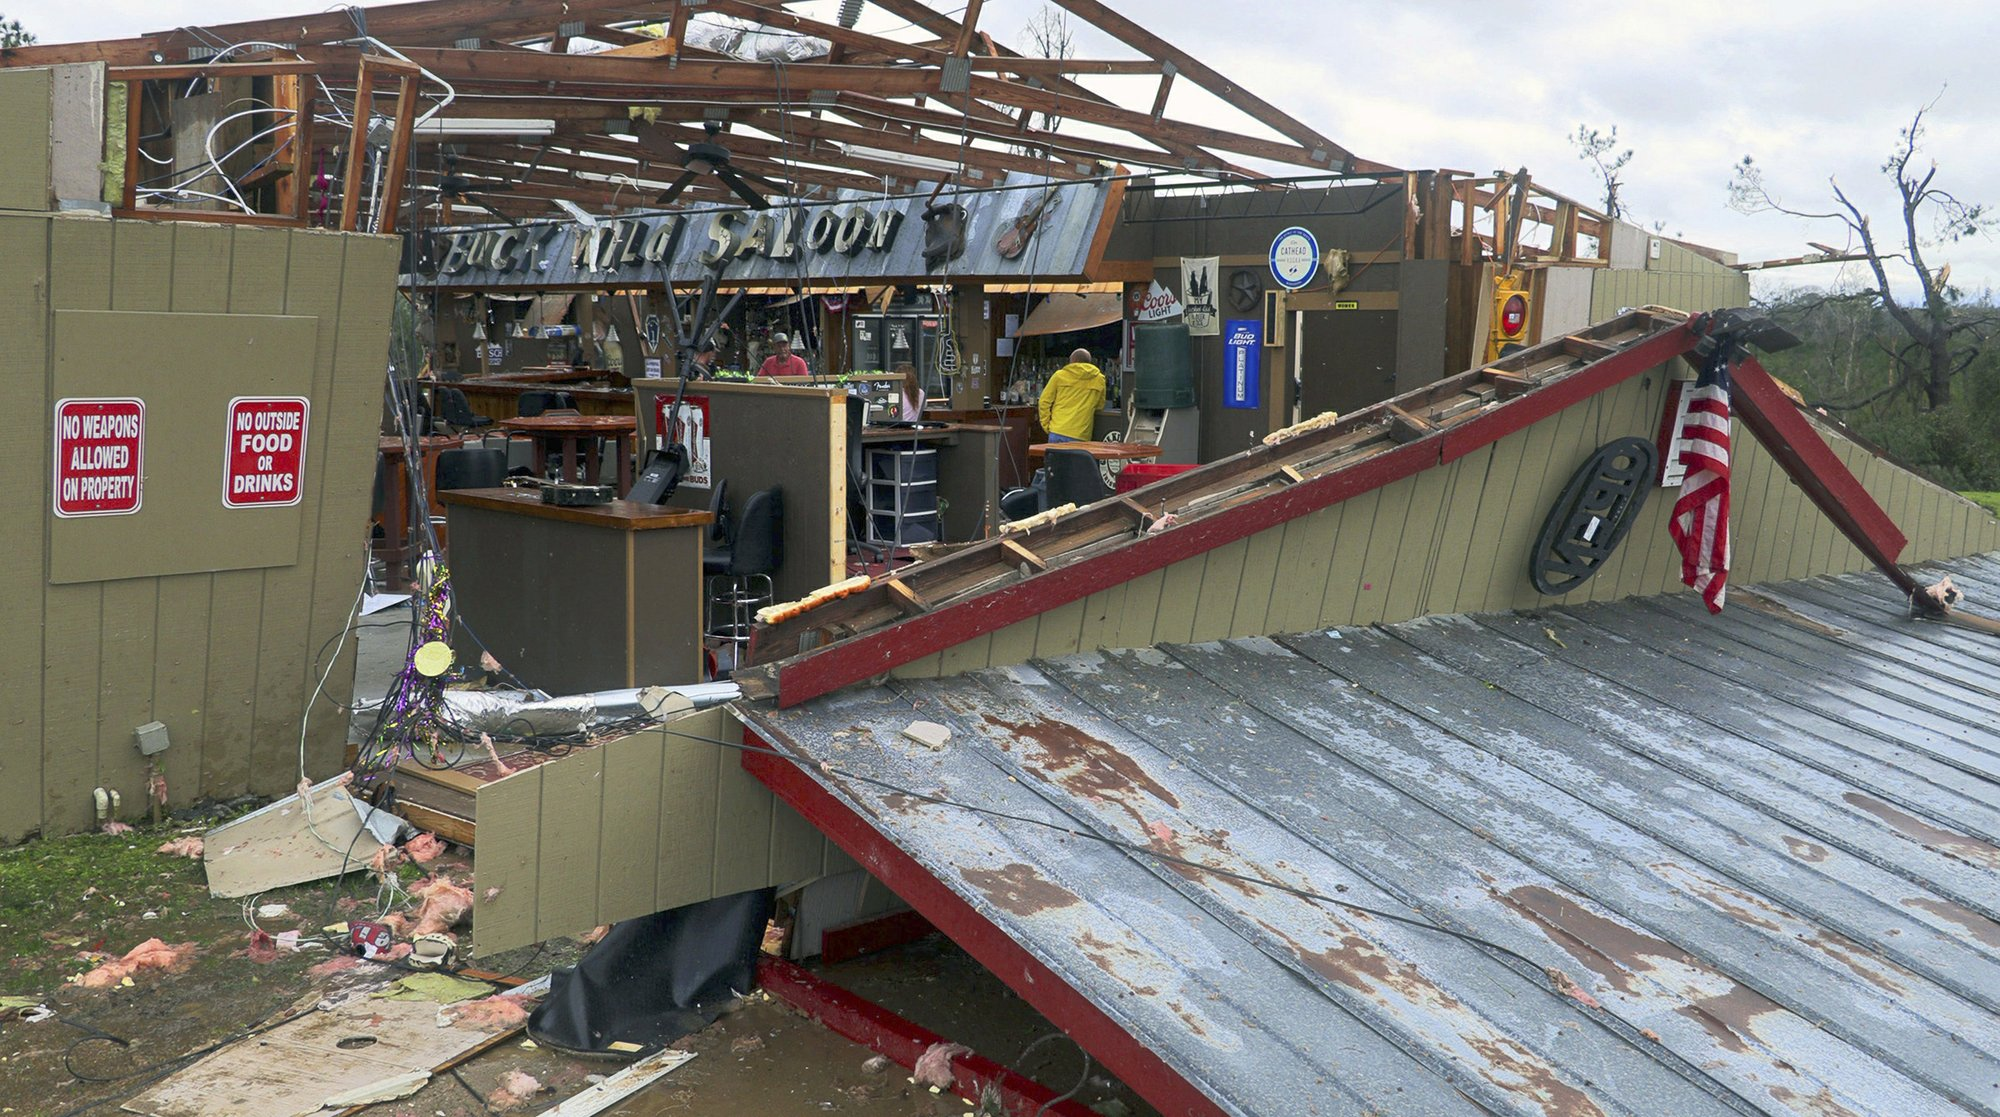 Tornado kills 23 in Alabama, rescuers search for victims